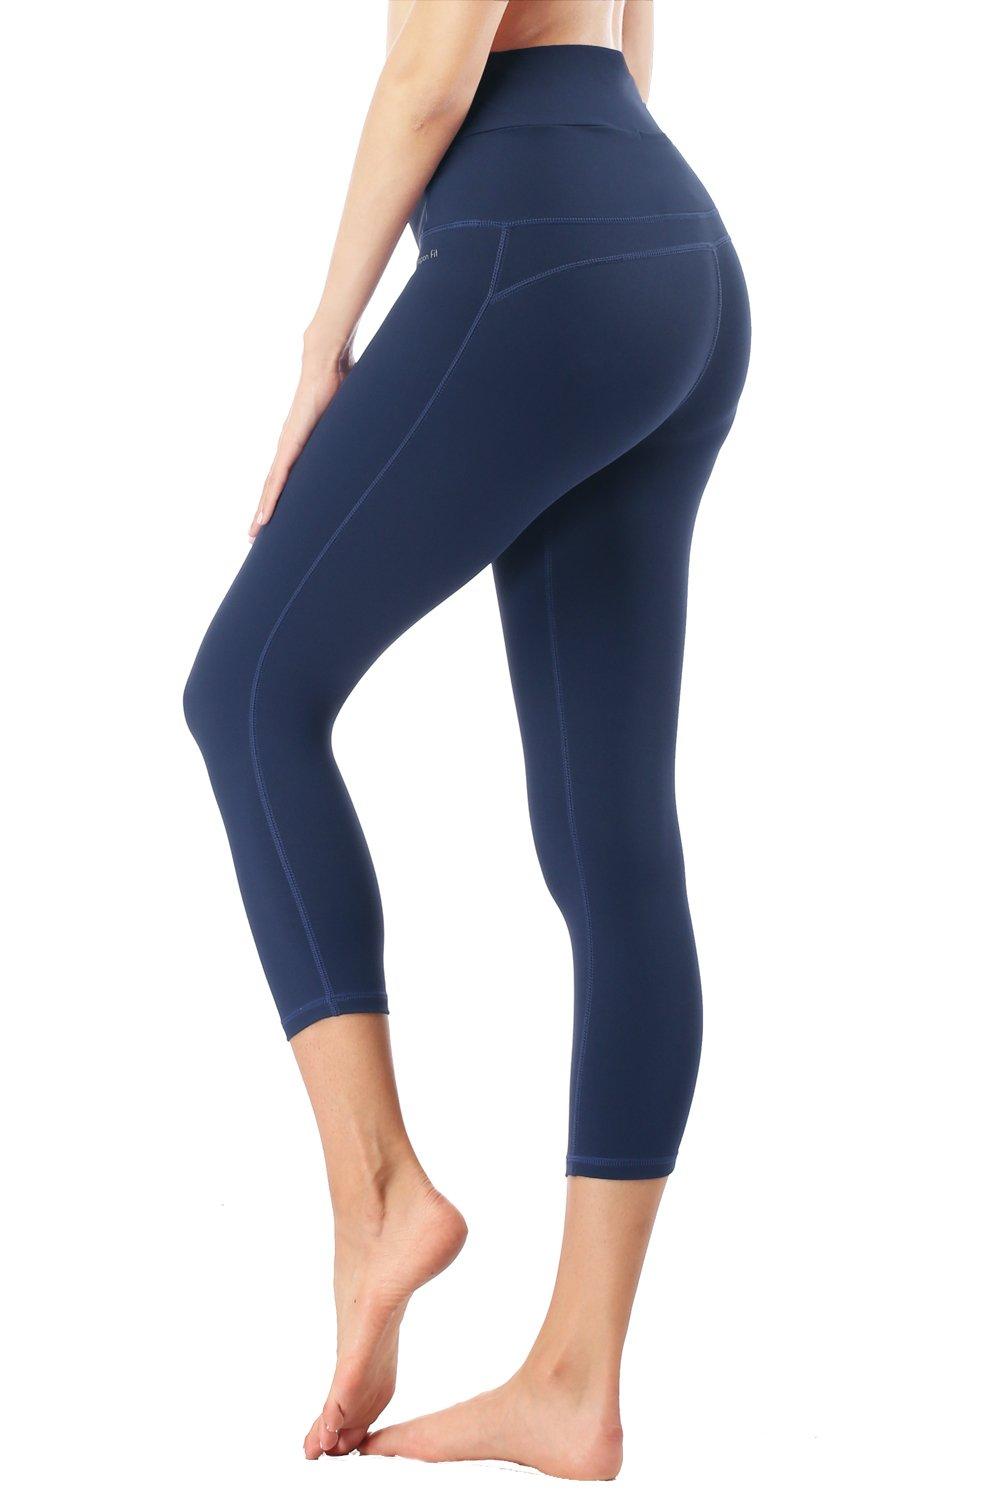 Dragon Fit Compression Yoga Capri Pants Tummy Control 4 Way Stretch Workout Running Yoga Capri Leggings Non See-Through (Small, Capri-Blue)